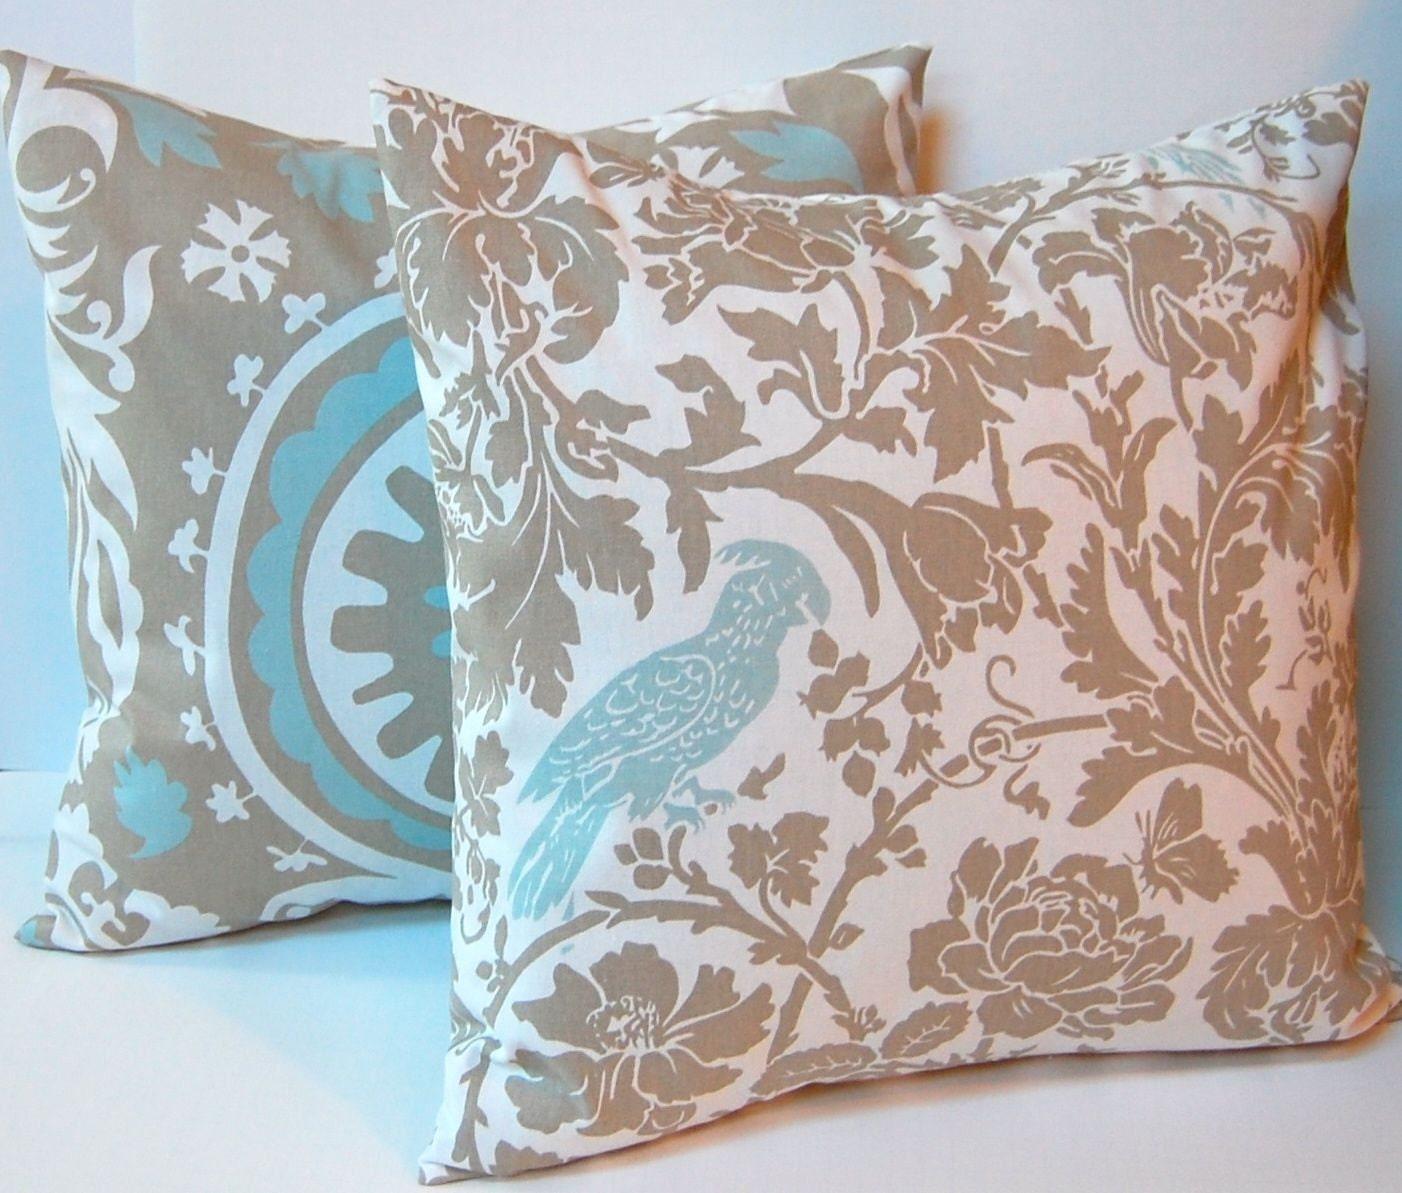 Euro Sham Decorative Throw Pillow Covers 24 x by FestiveHomeDecor